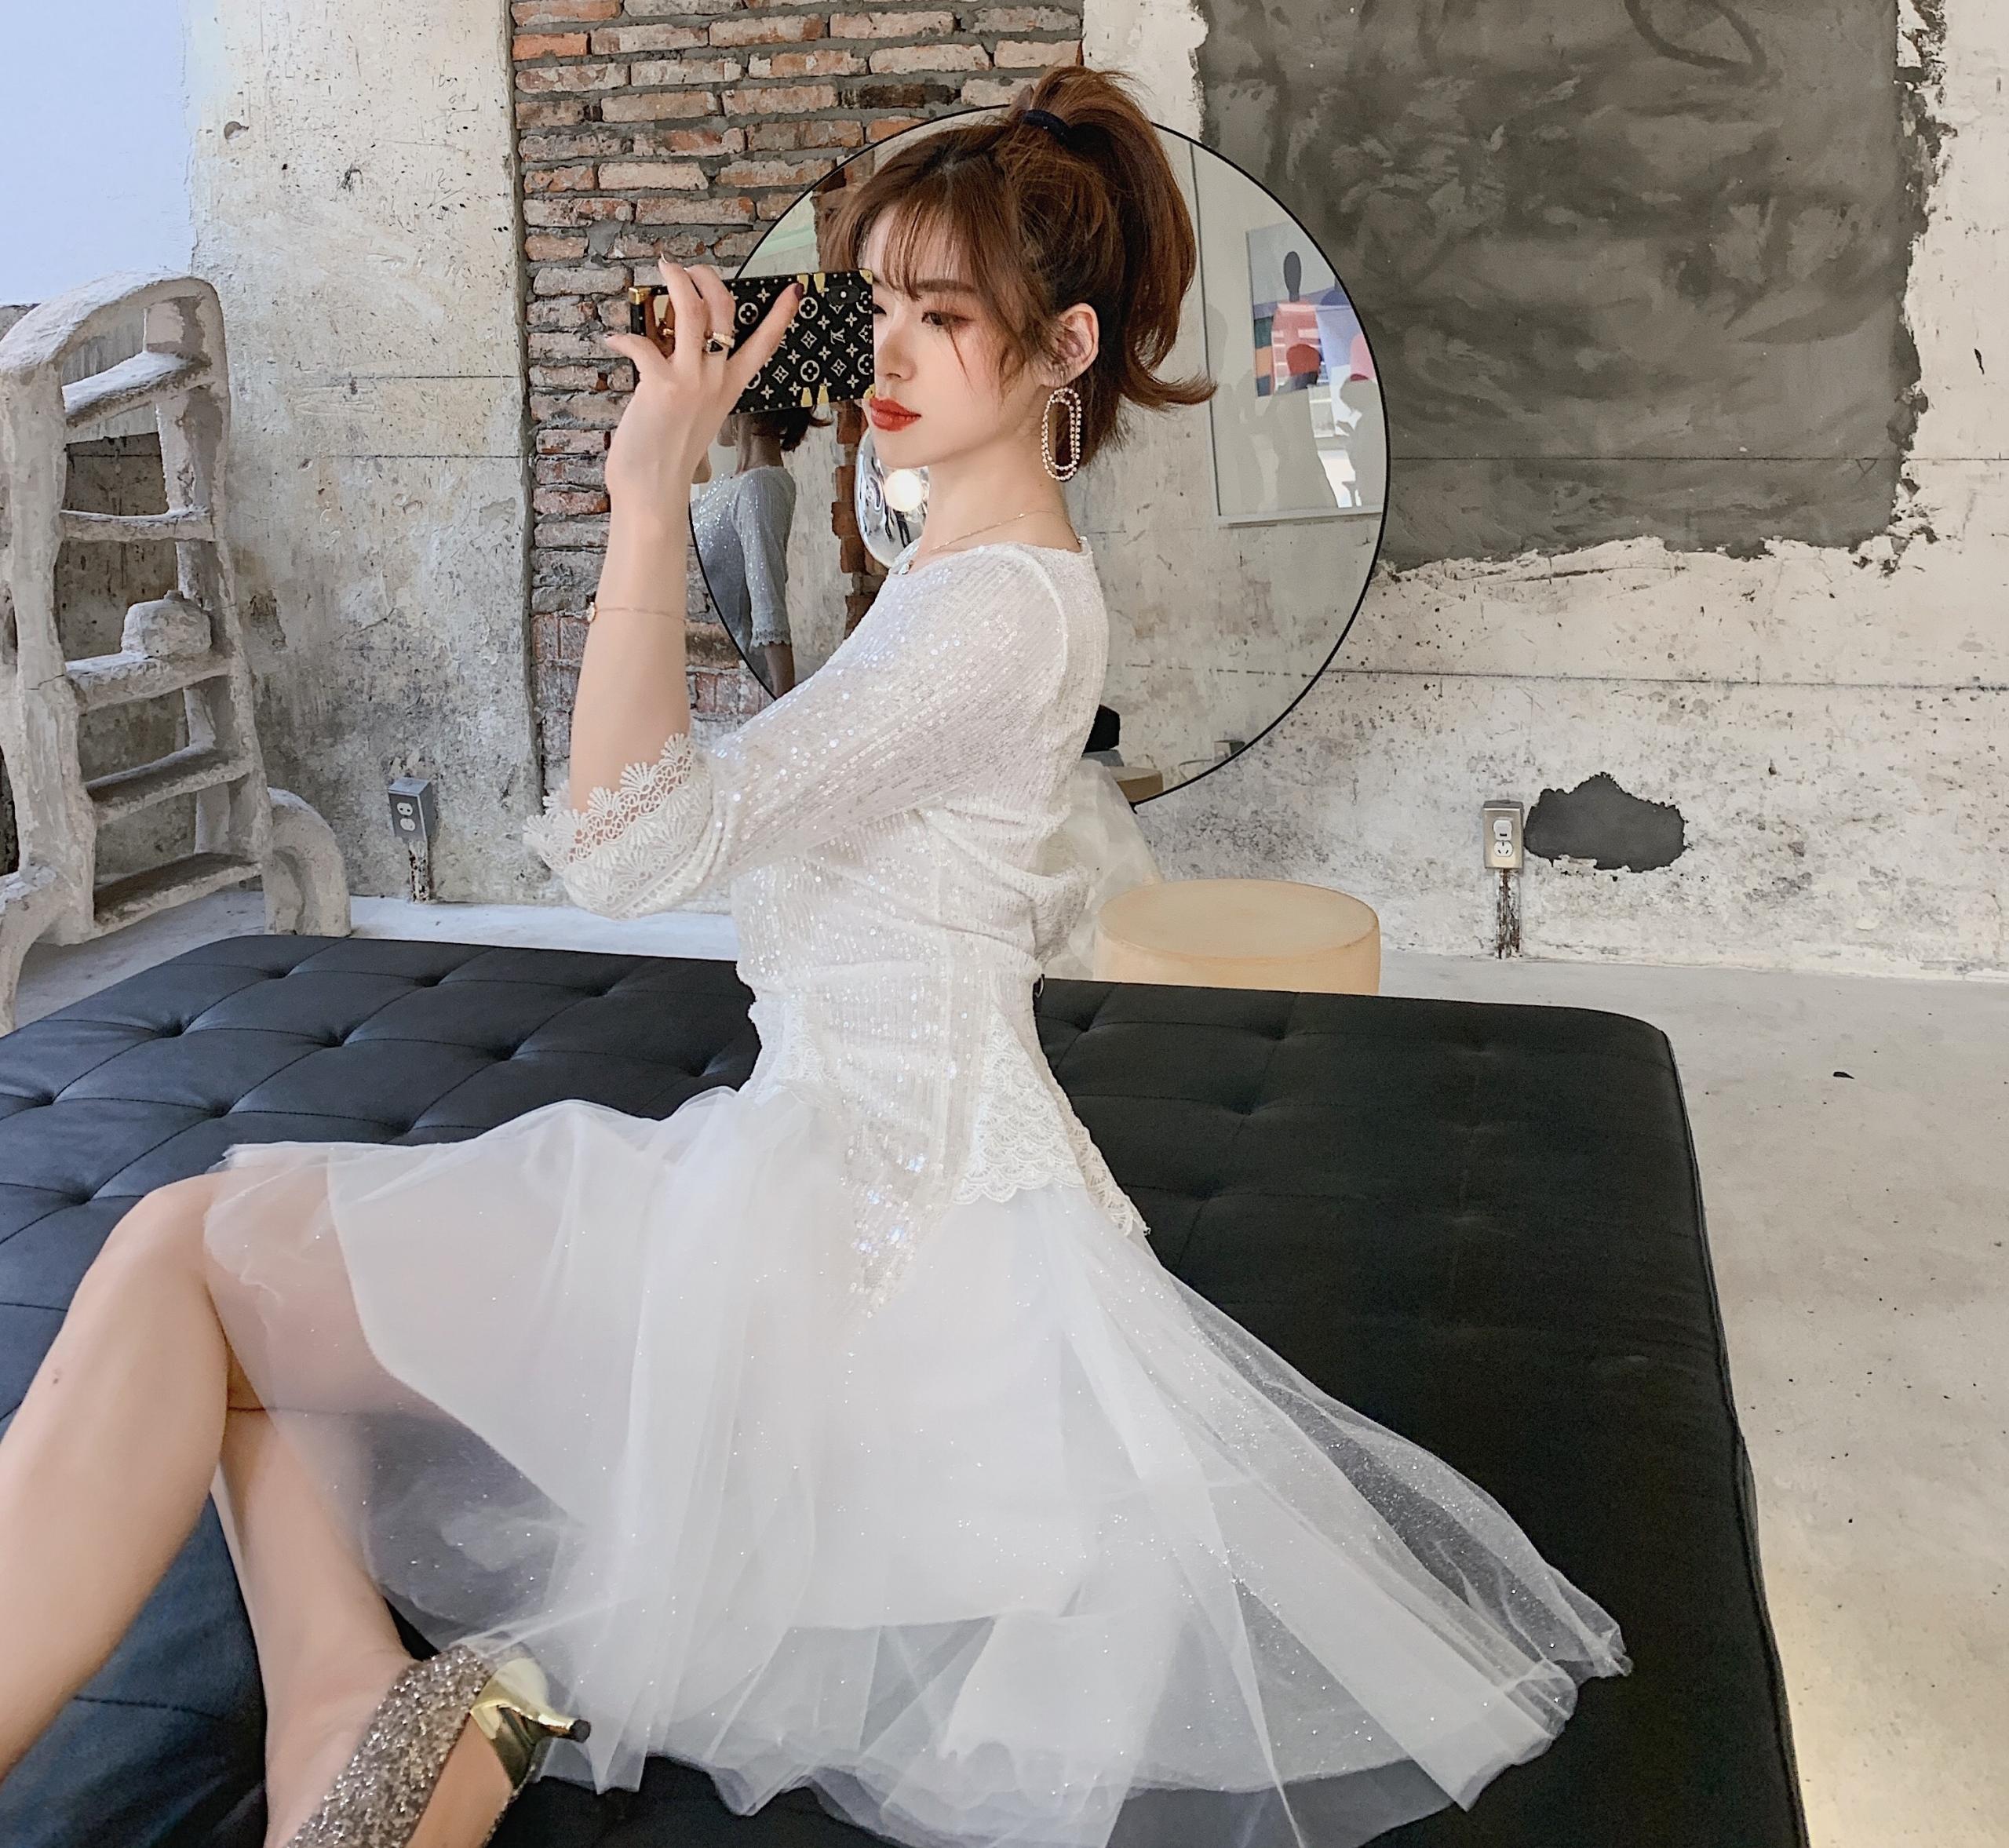 Runway Women Mesh Ball Gown Party Dress  Spring Sexy Sequined Half Sleeve Slim Luxury Fashion Designer Dress Elegant Vestido 2